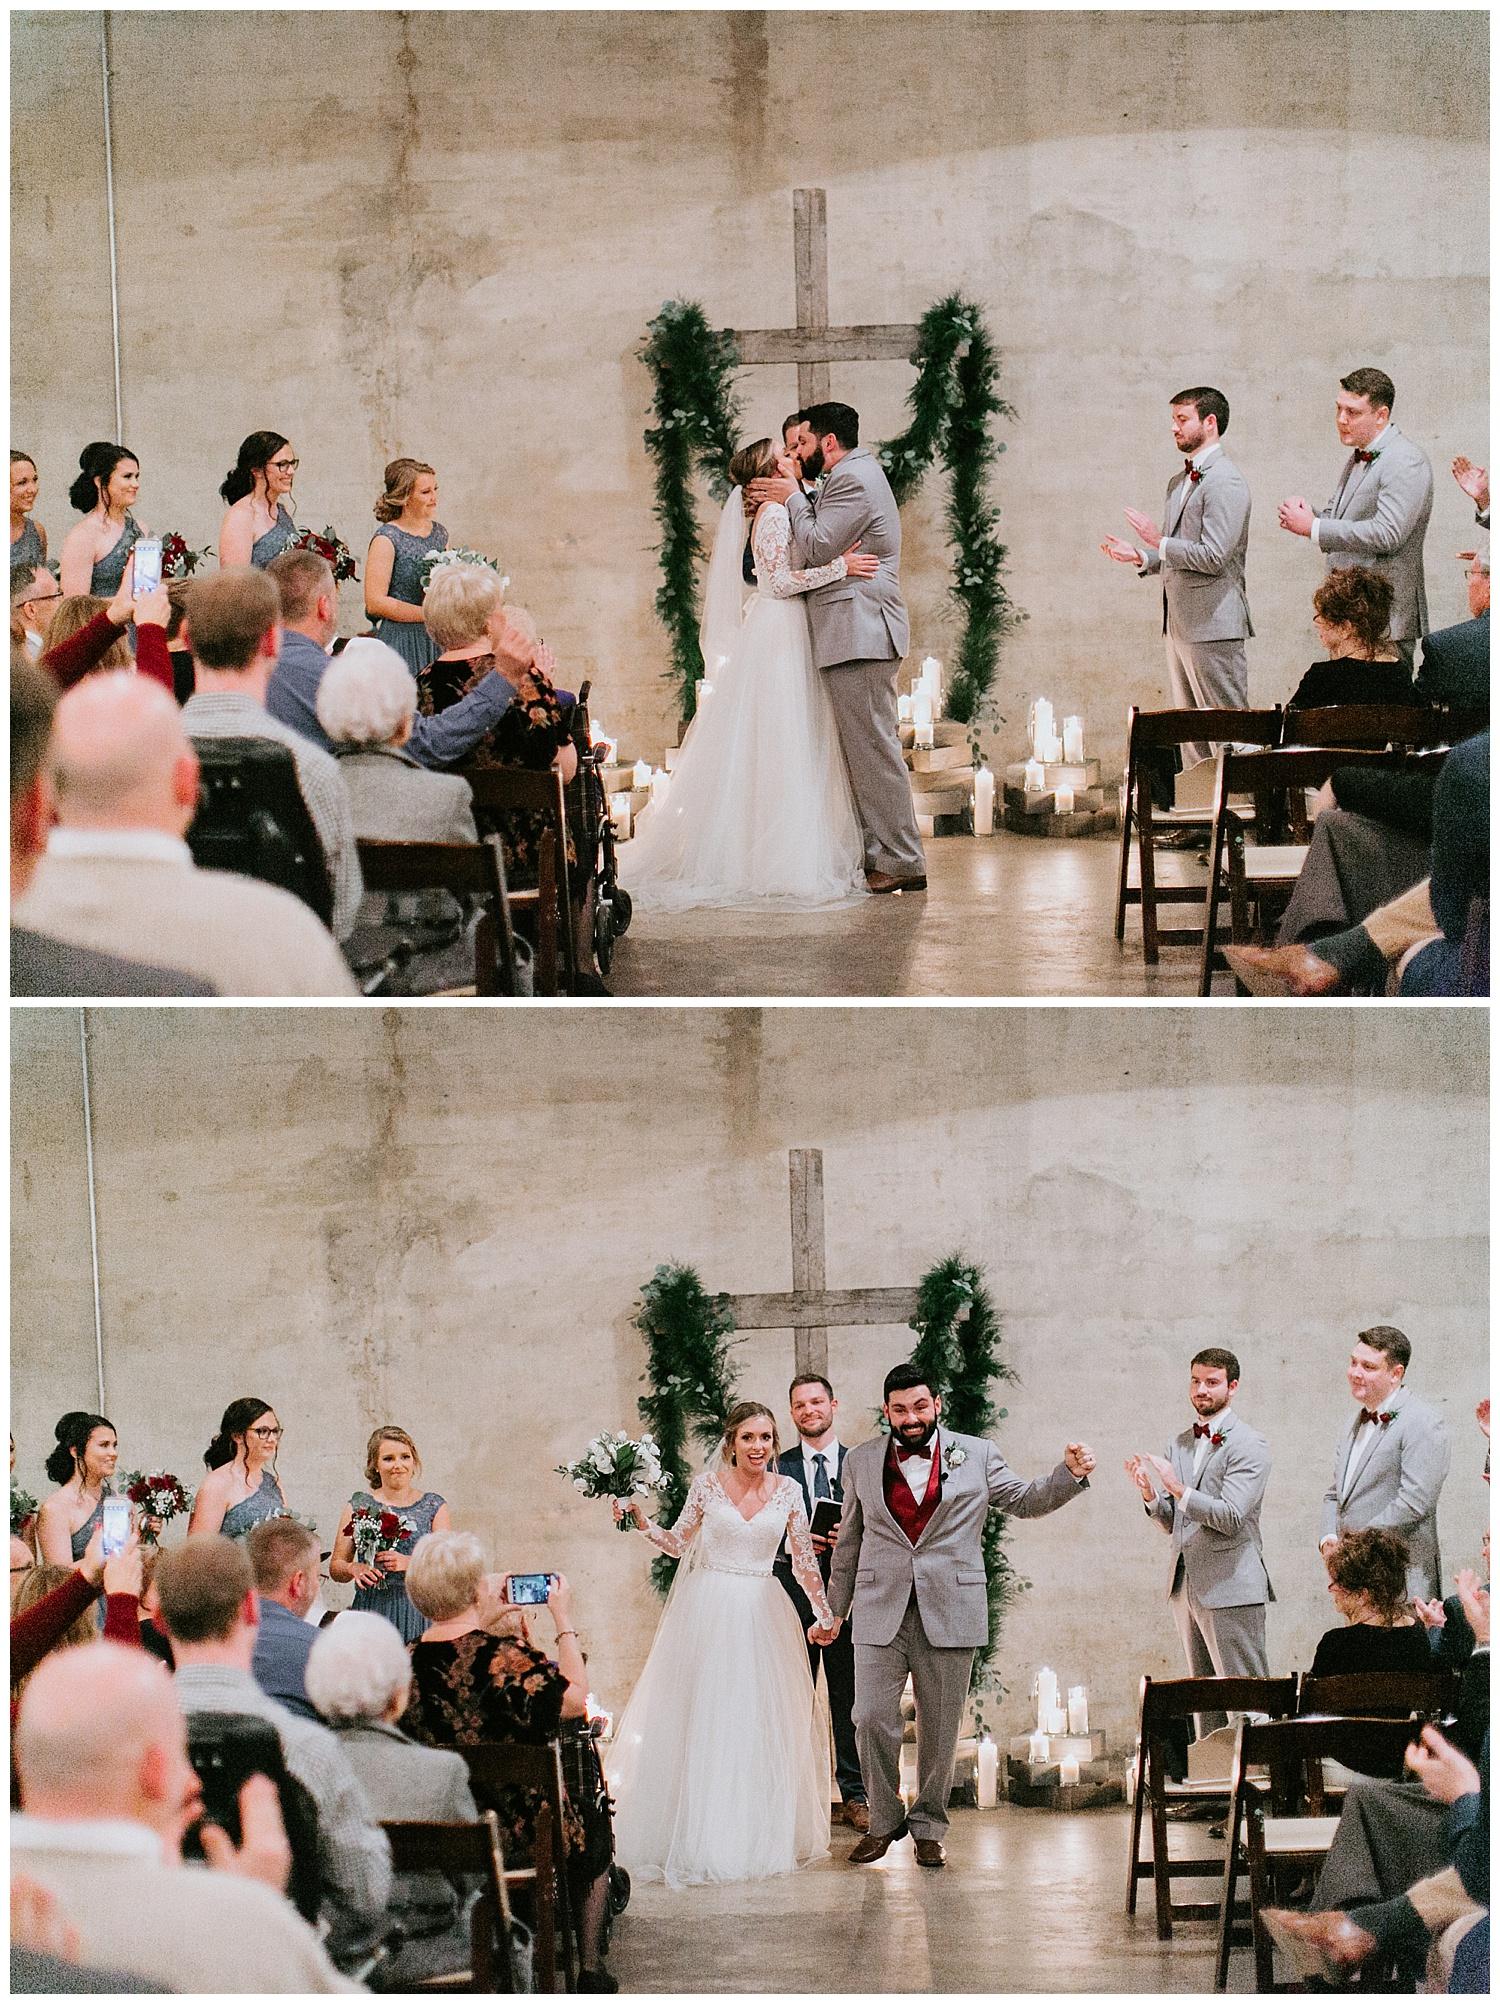 winter-wedding-the standard-knoxville_2019-01-23_0074.jpg